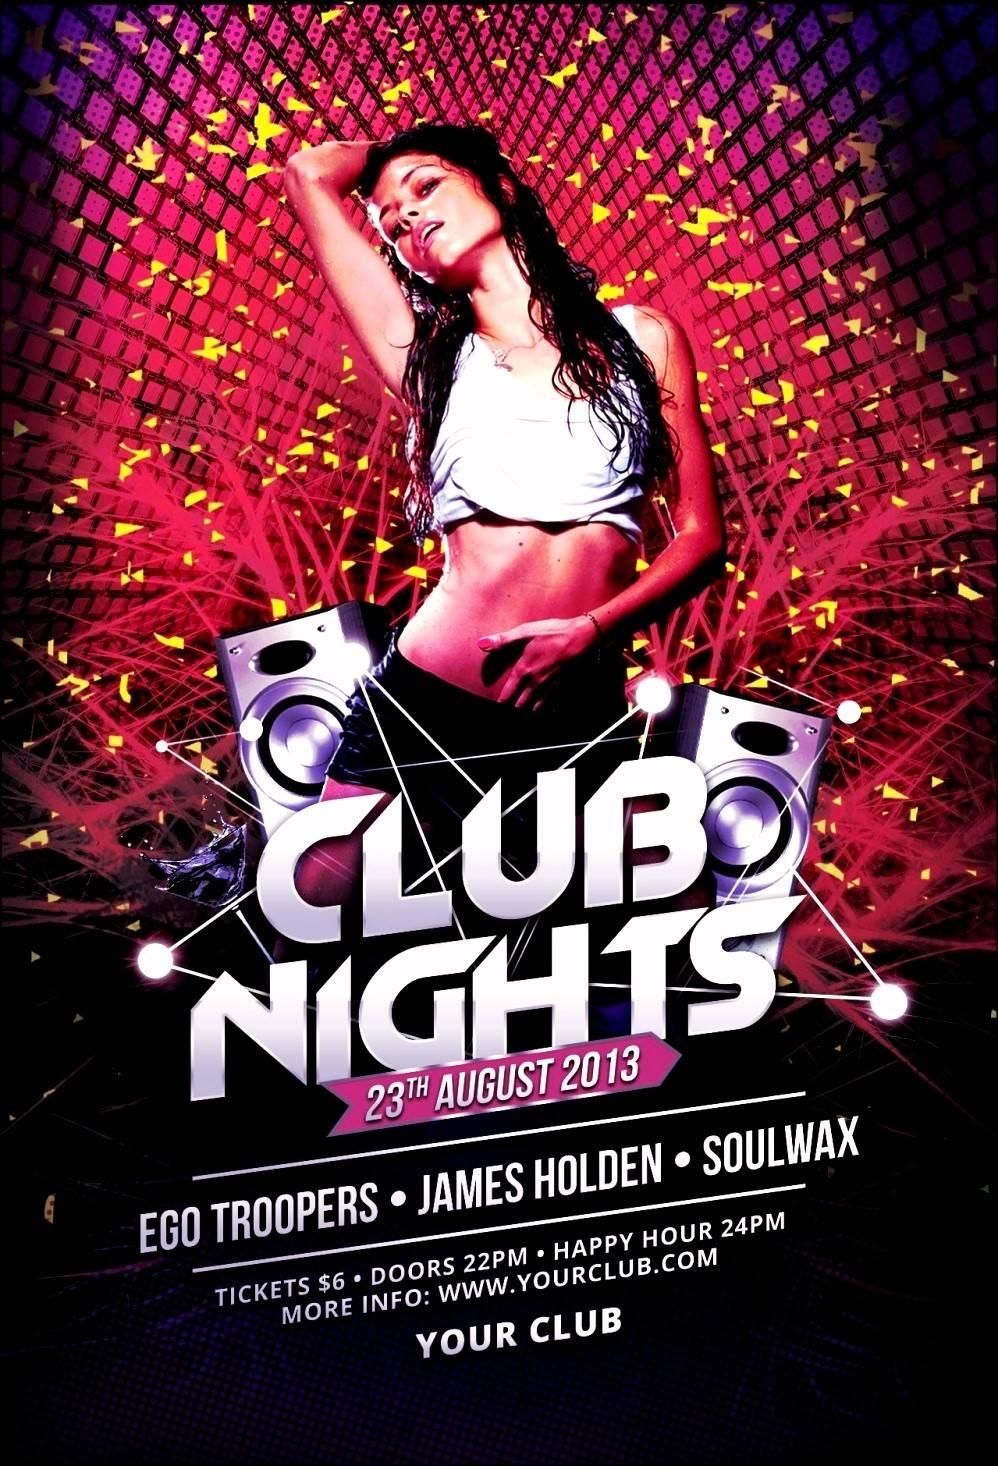 Nightclub Flyer Background Templates